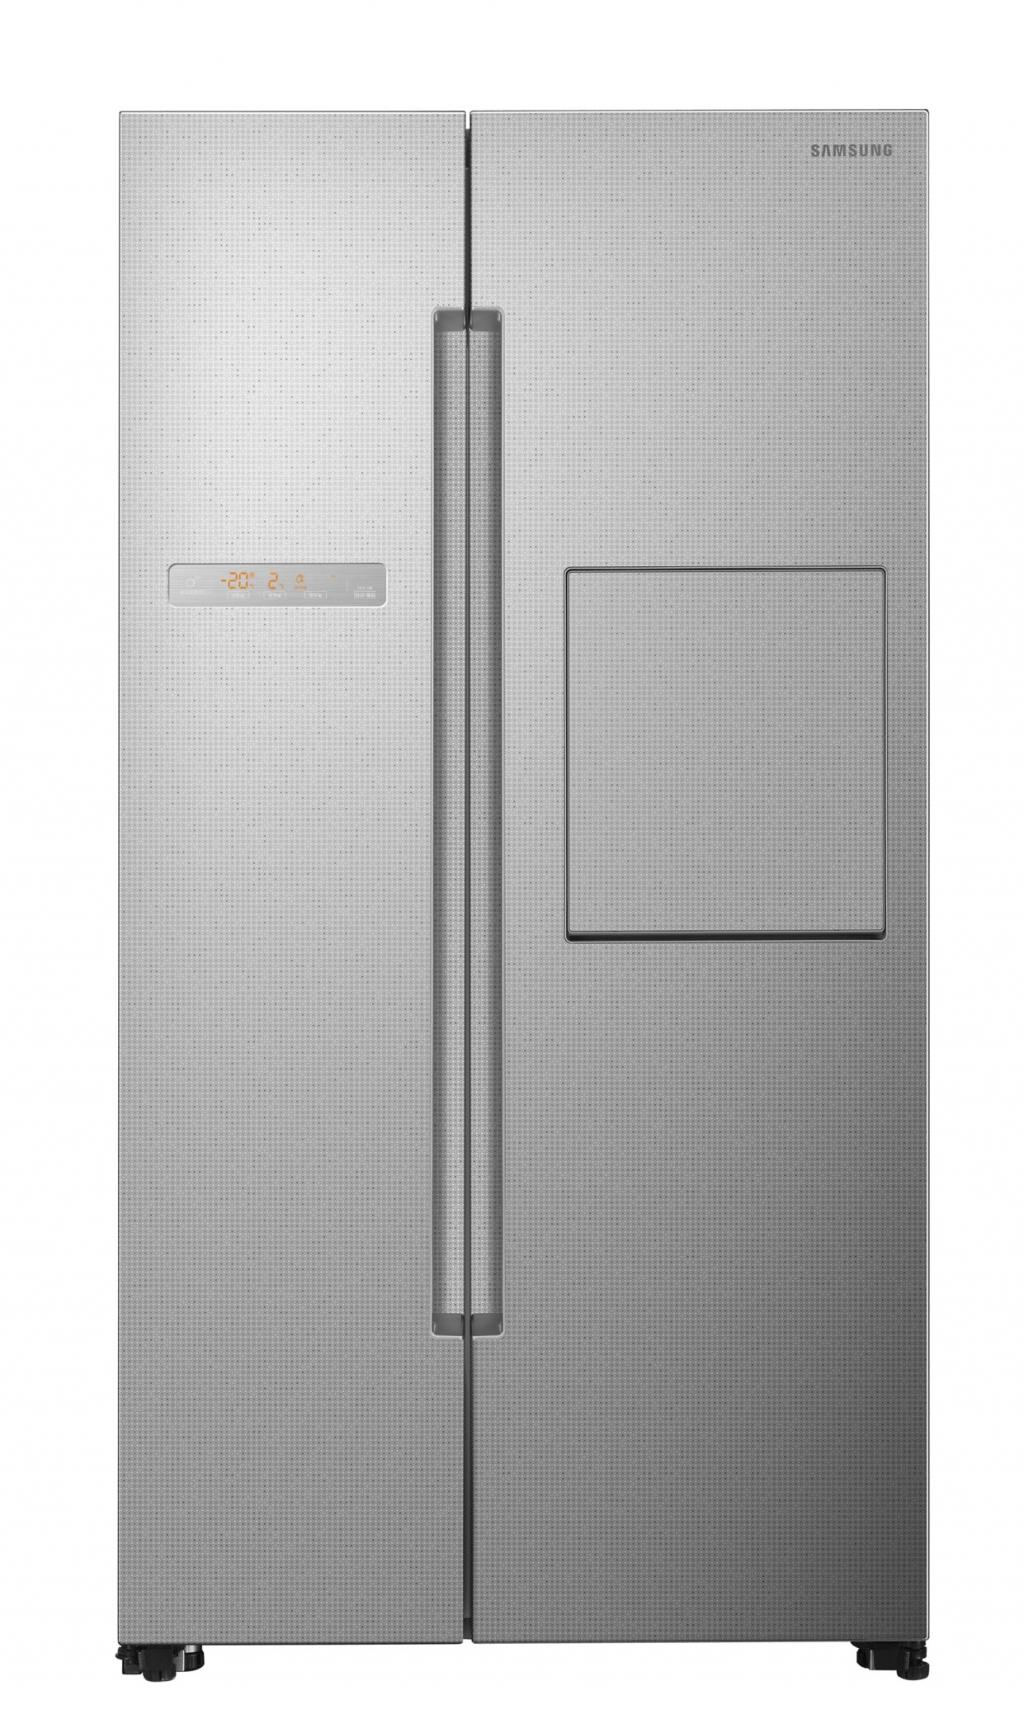 Samsung Unveils Zipel Grande Style 8000